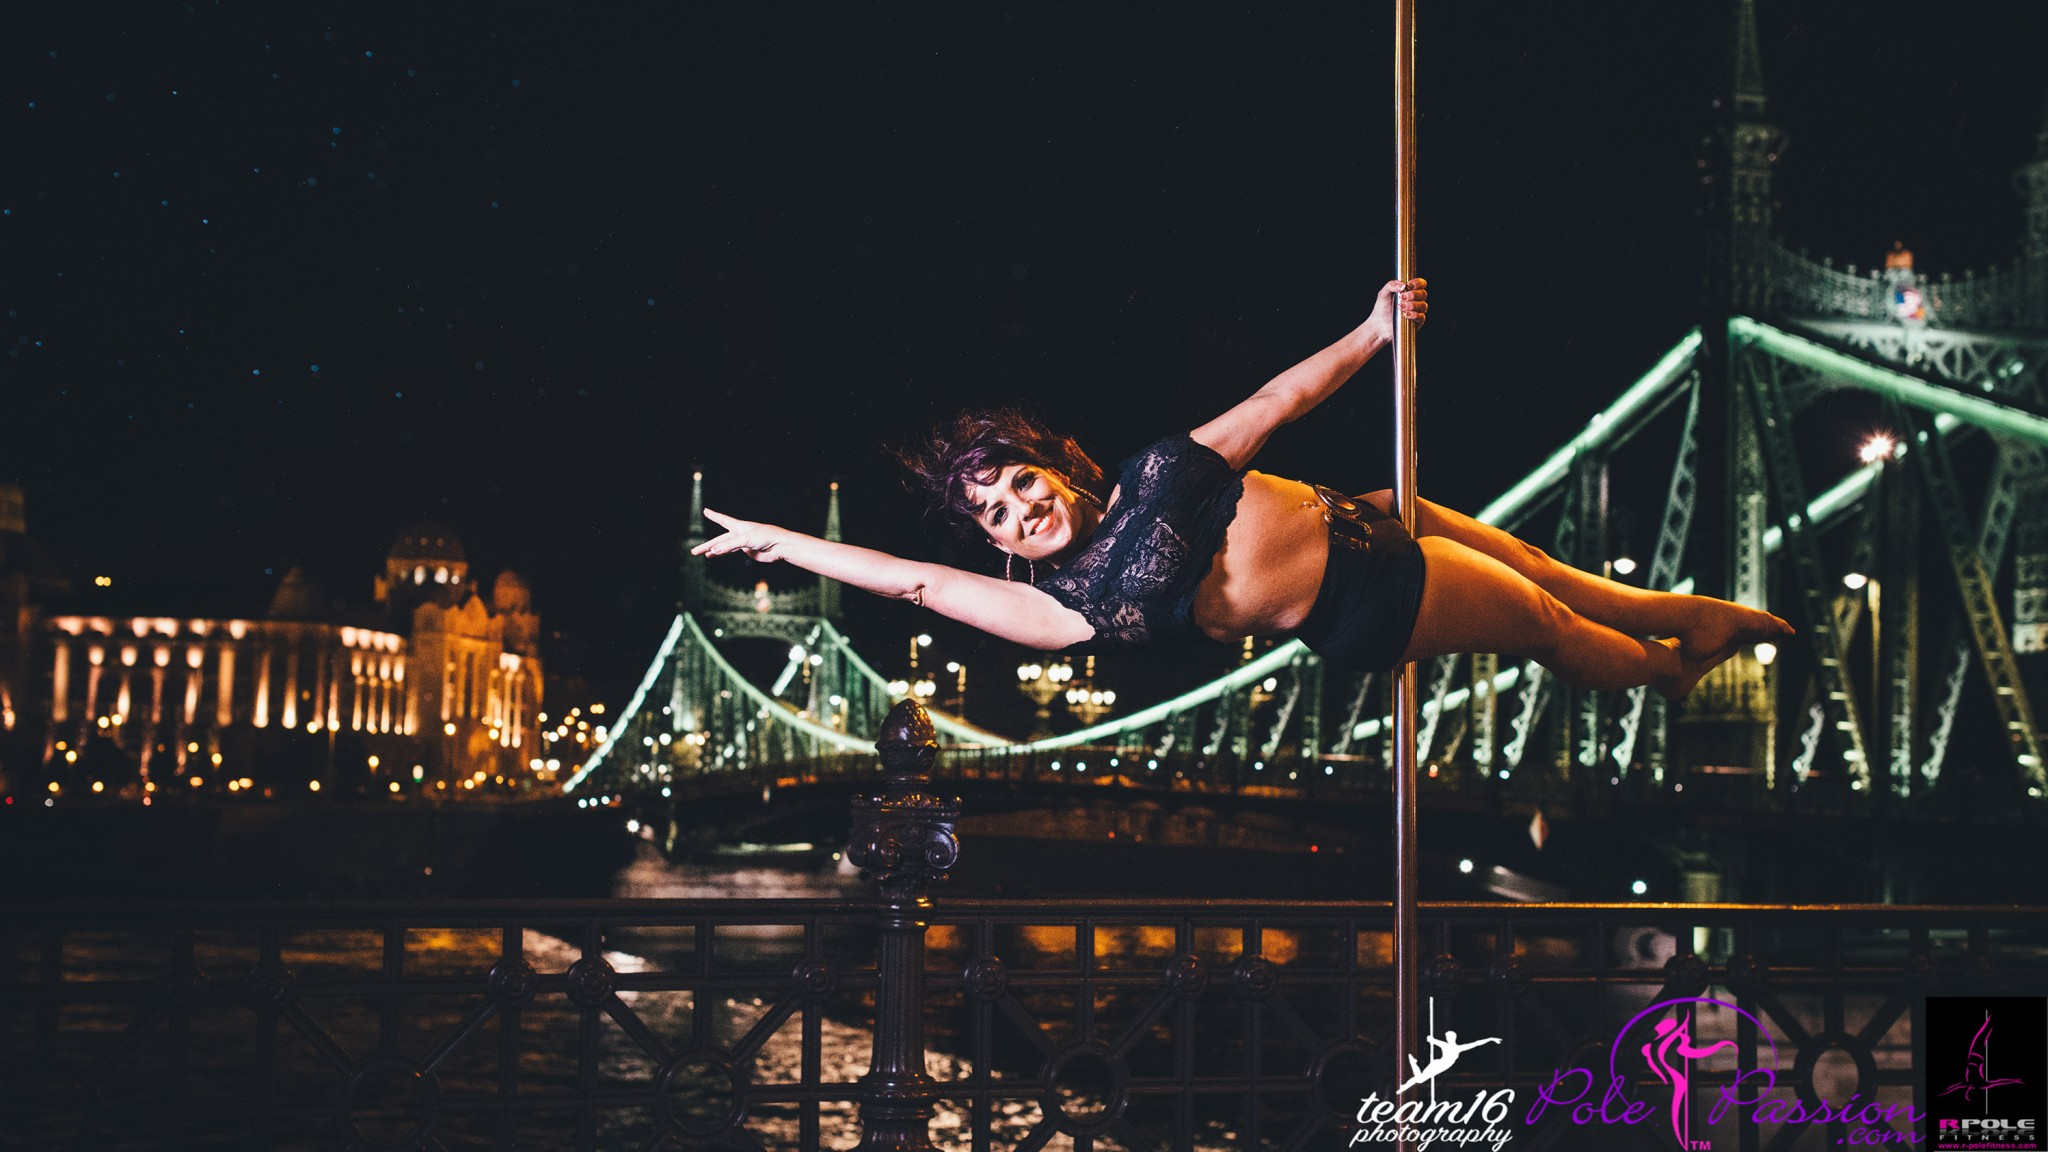 Pole-Passion-Budapest-Retreat-2015-1080(small)